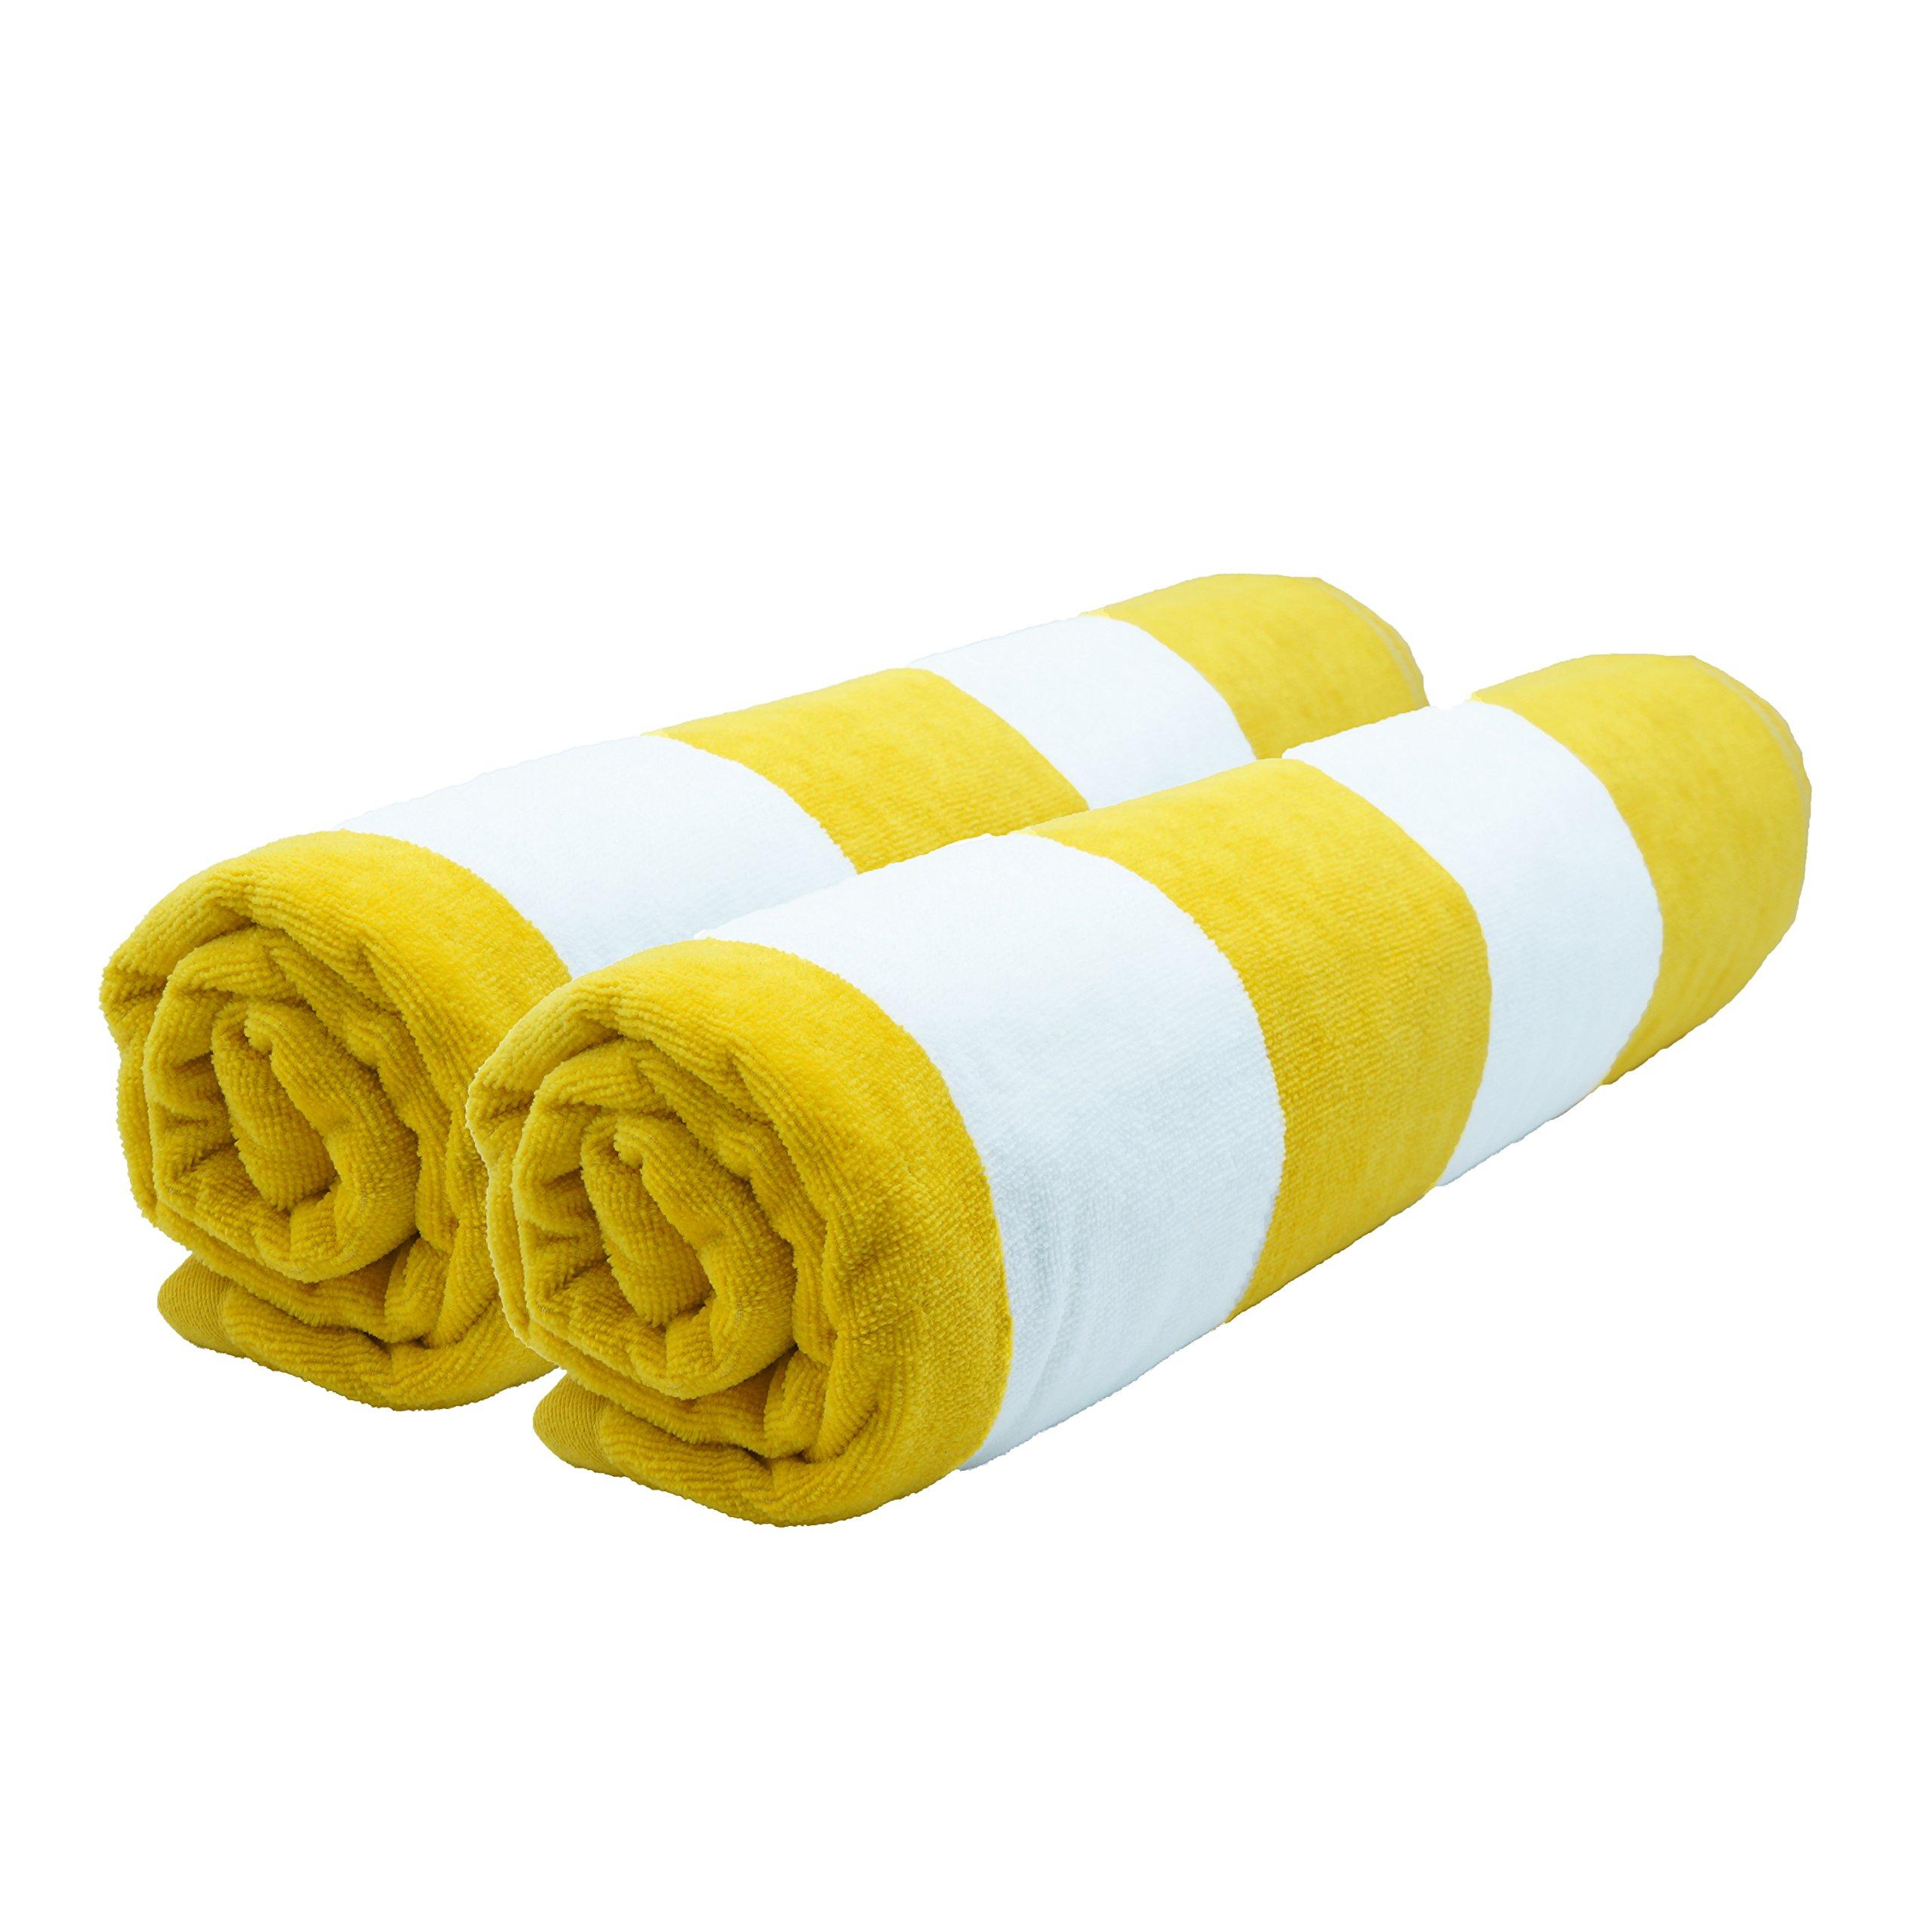 Lara Cabana 100% Turkish Cotton Beach Towel Pool Spa Bath Extra Soft & Large (35'' x60) by Corner4Shop (Yellow 2 Pack)